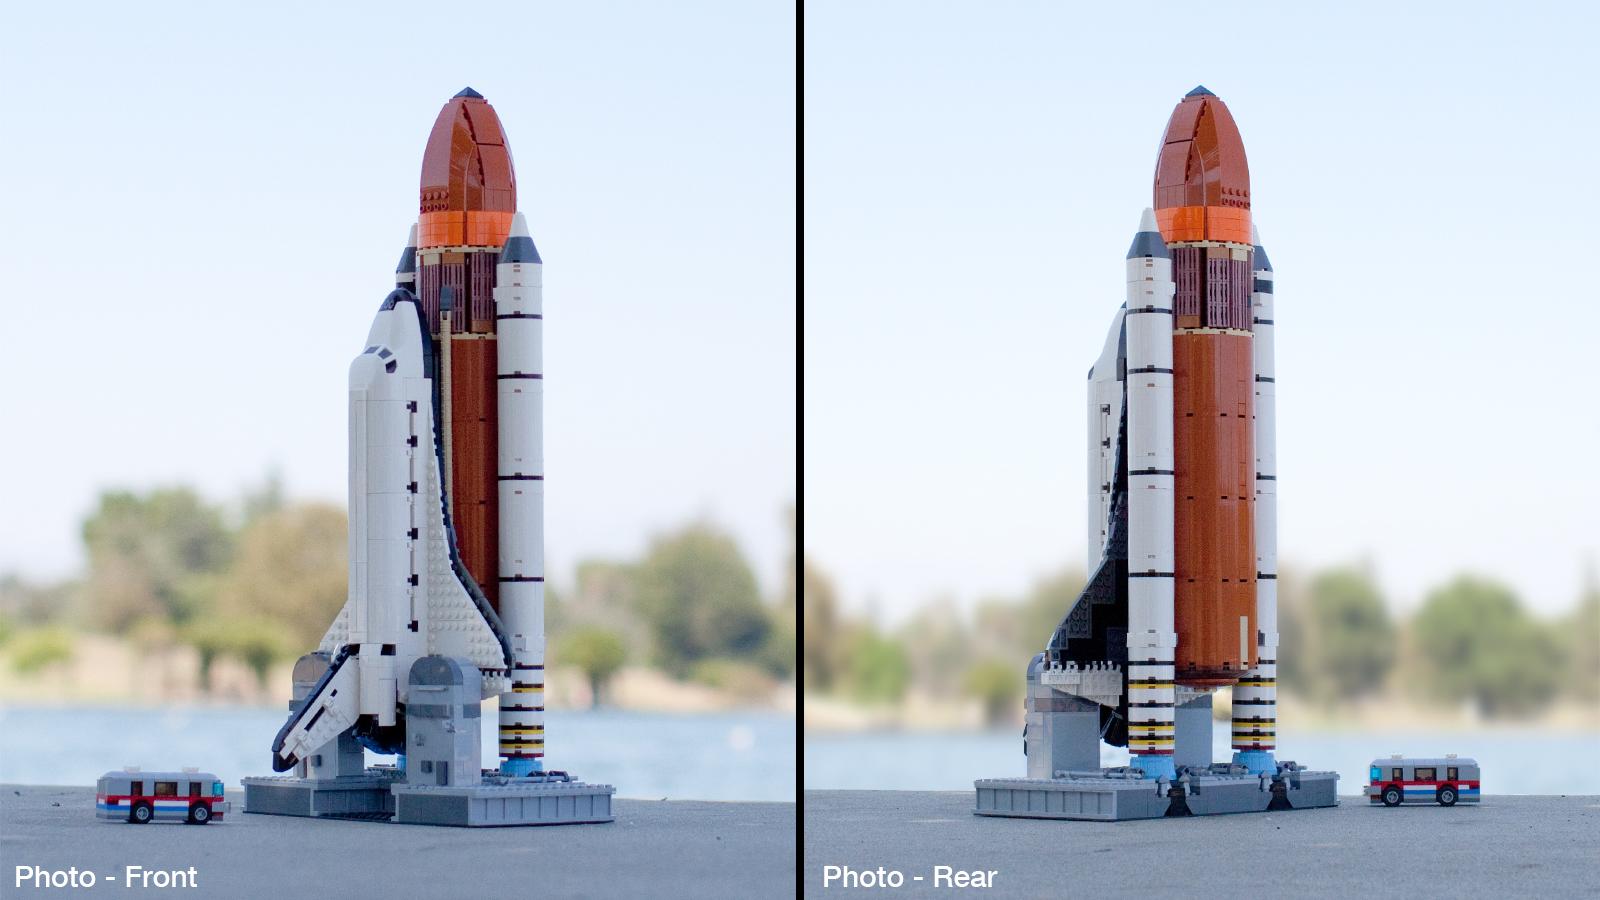 lego space shuttle saturn v scale - photo #12